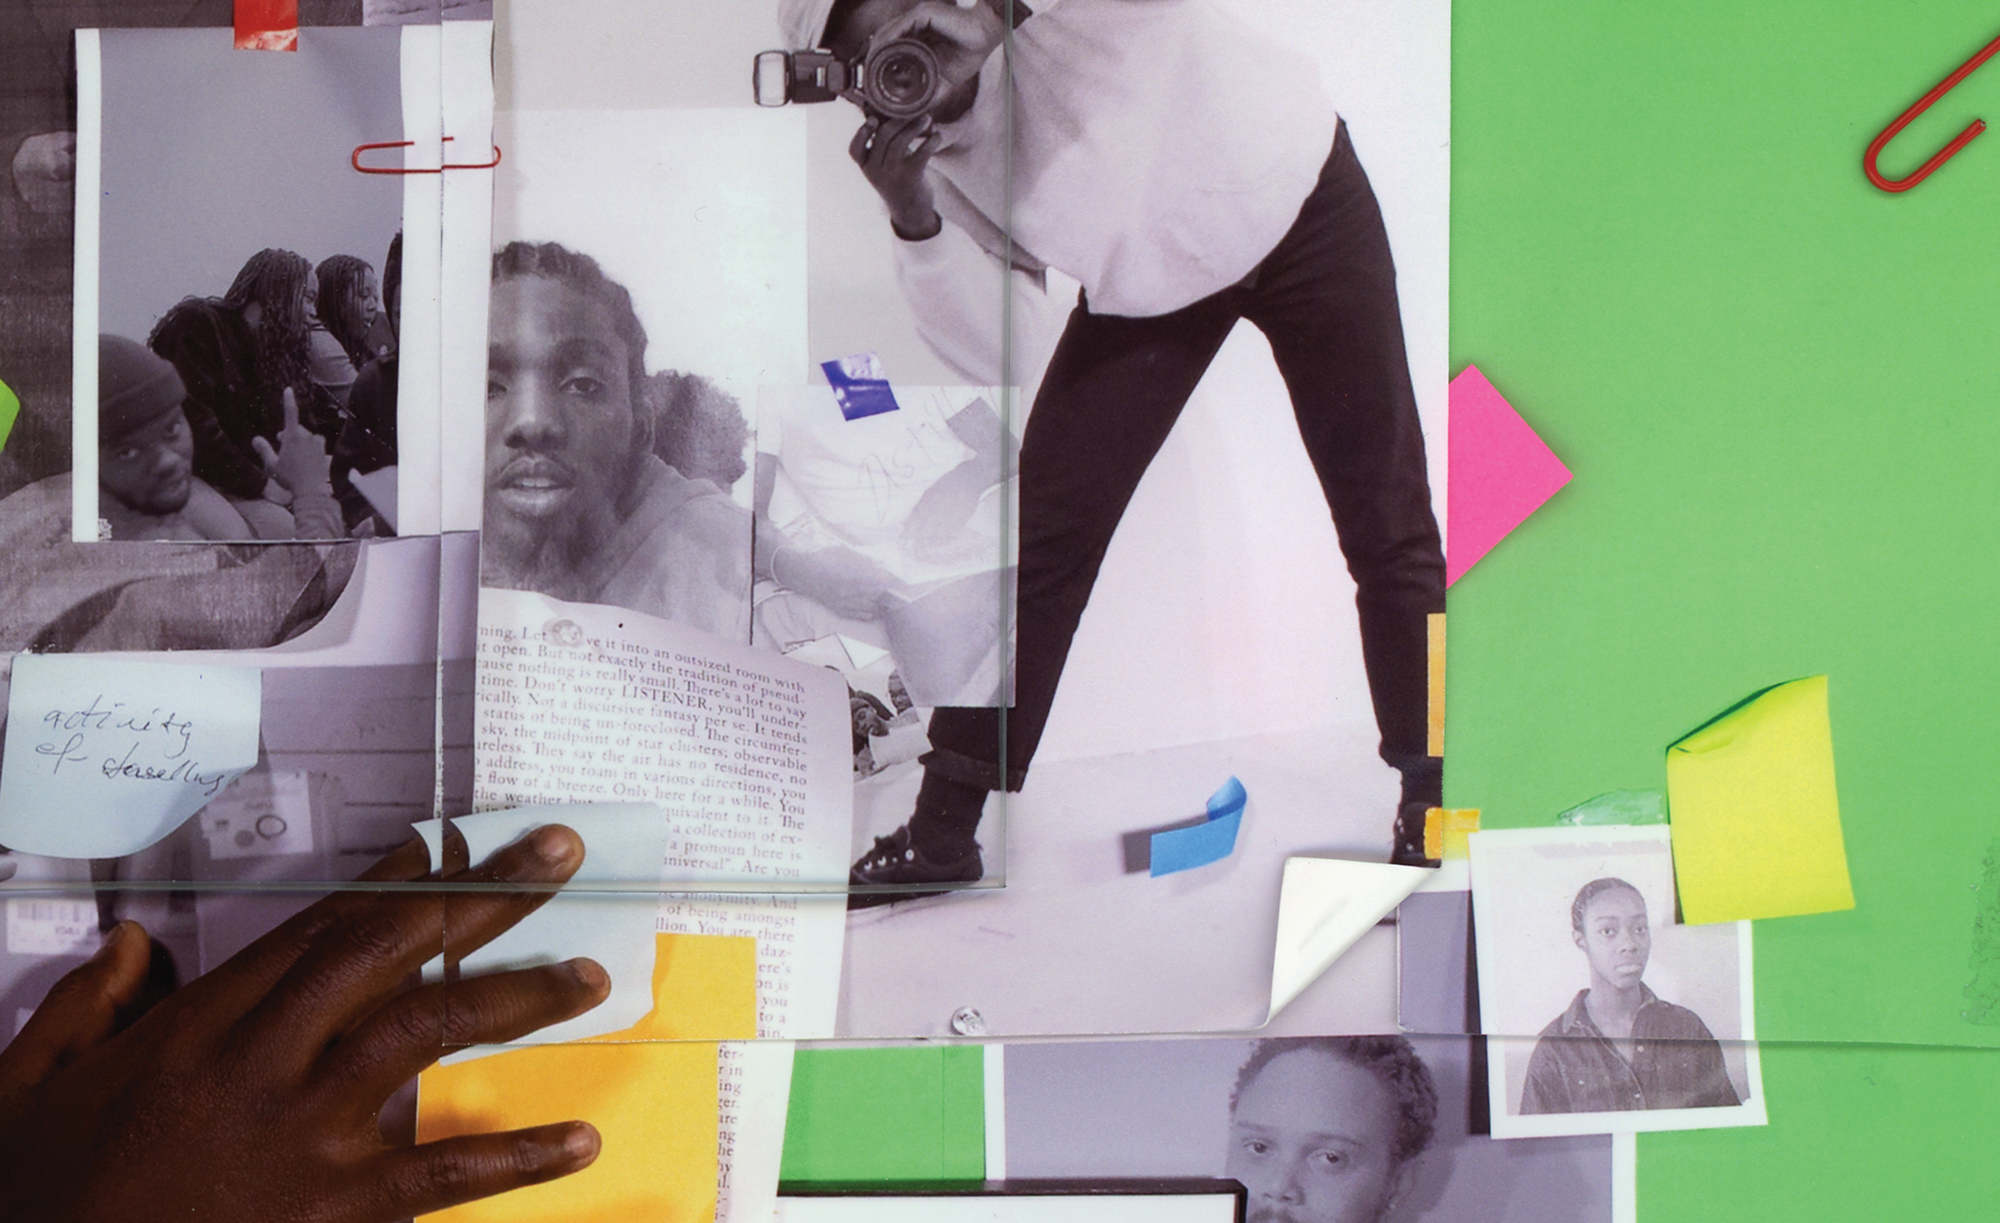 Luther Konadu, Figure as Index #2, 2020. Courtesy of artist